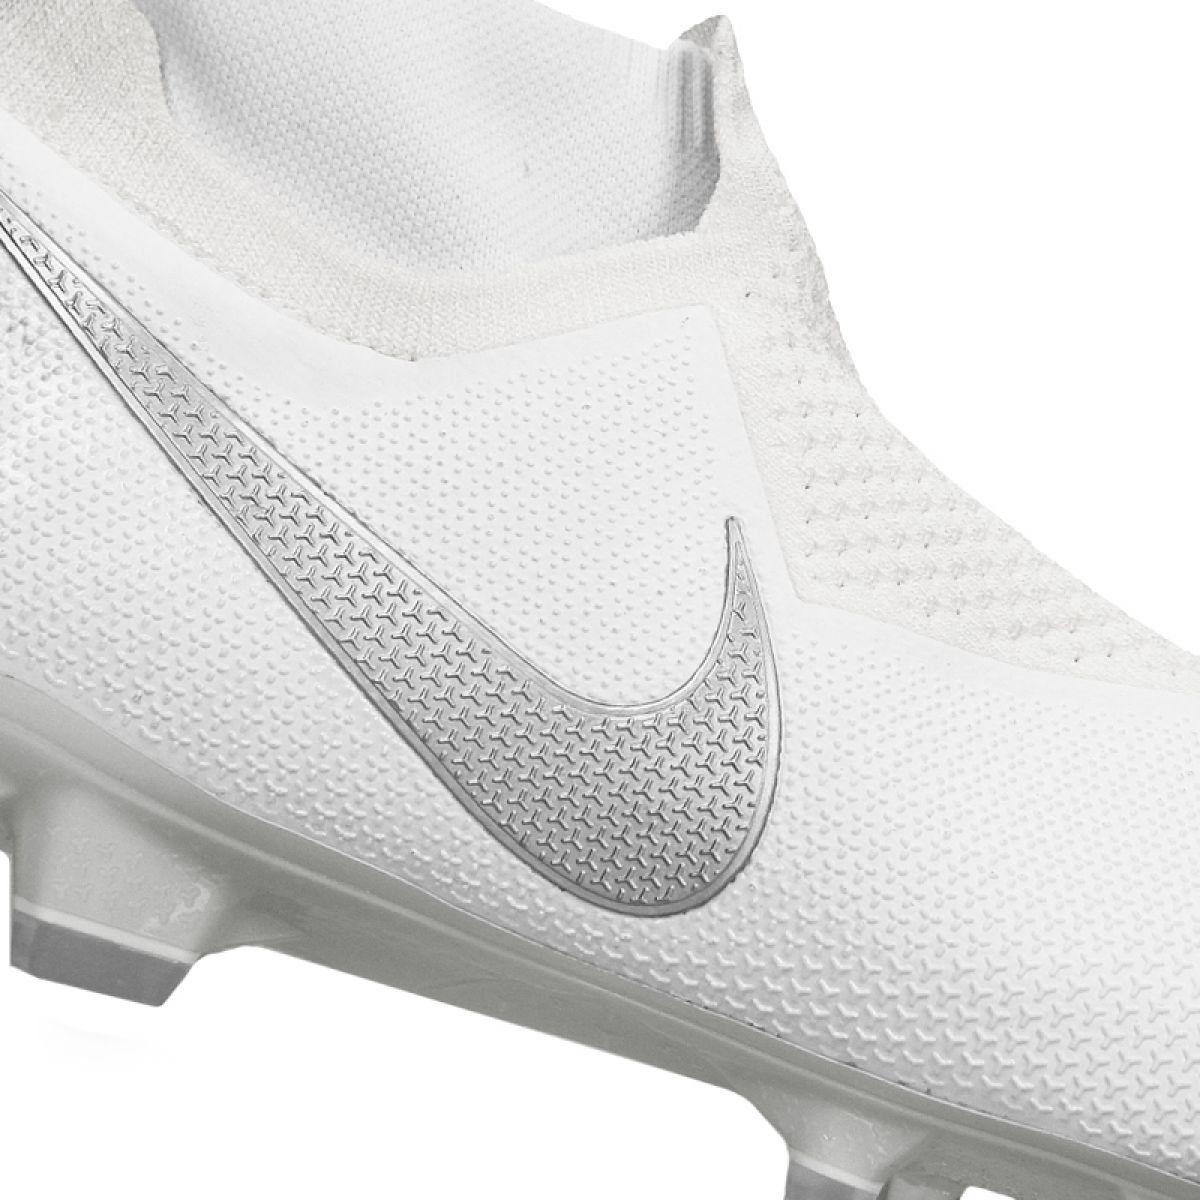 Corks Football Sport Nike Nike Phantom Vsn Elite Df Fg M Ao3262 100 Football Shoes White White Football Shoes Nike Shoe Laces